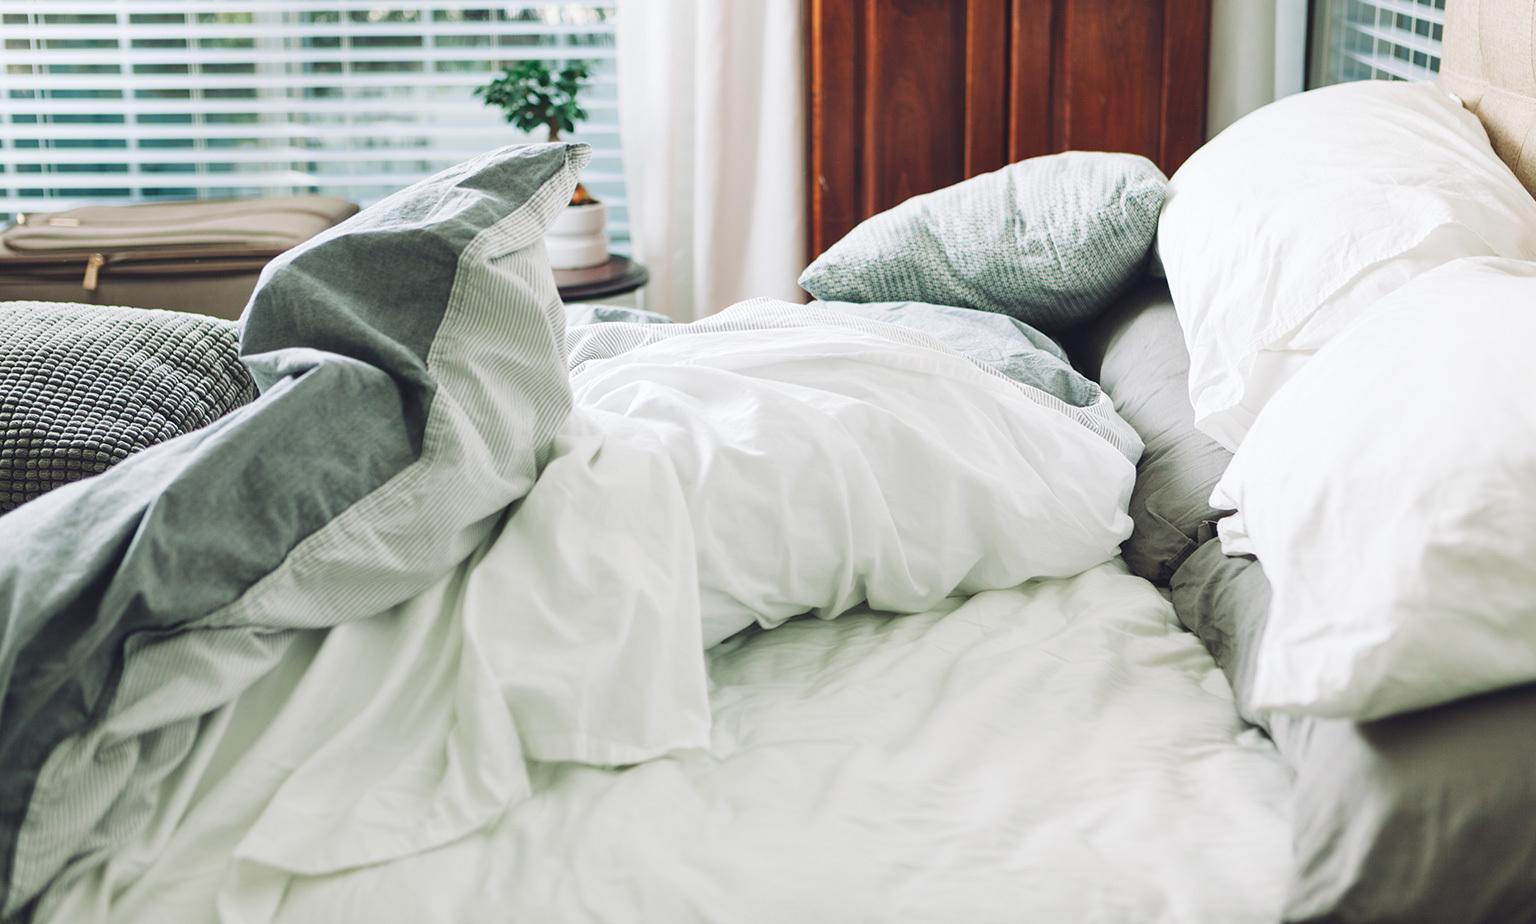 New Season, New Bedding